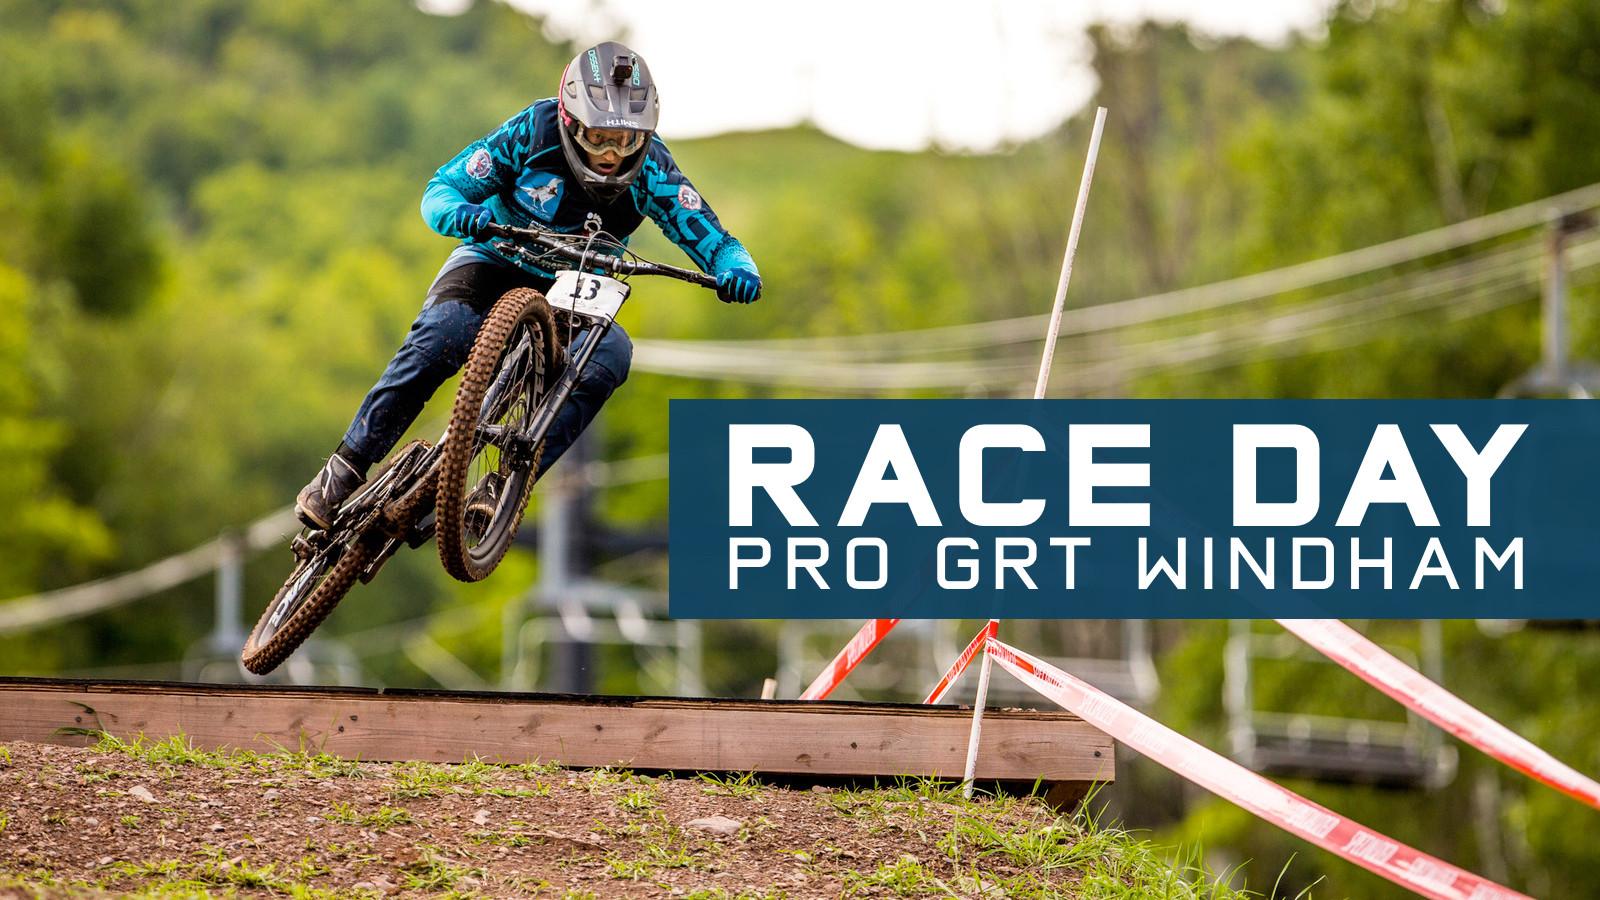 RACE DAY - Pro GRT Windham, New York